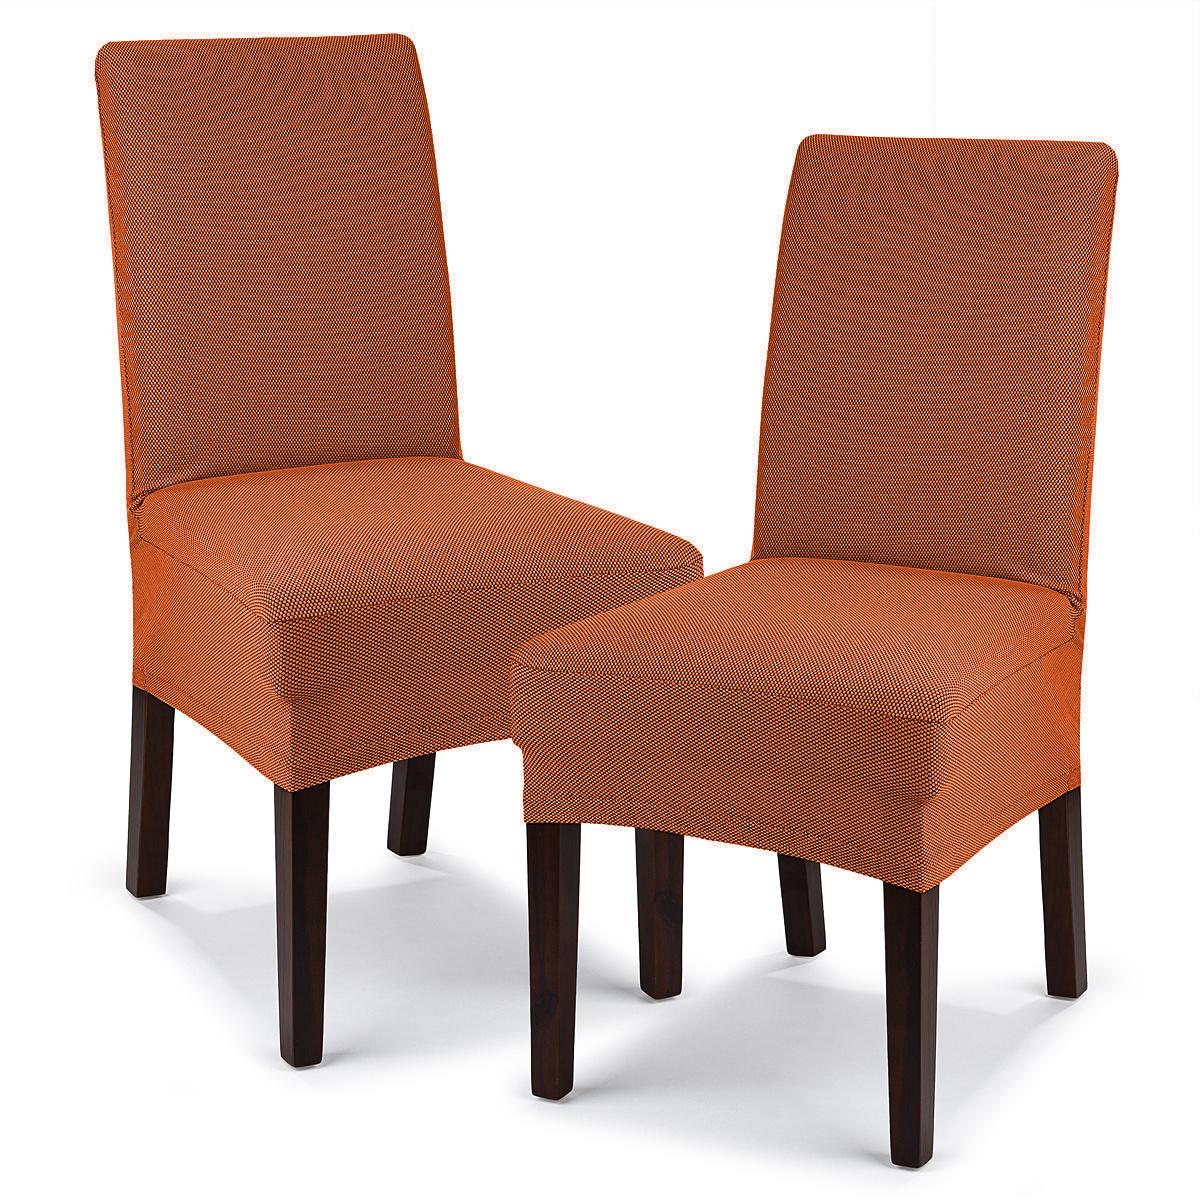 4Home Multielastický potah na židli Comfort terracotta, 40 - 50 cm, sada 2 ks